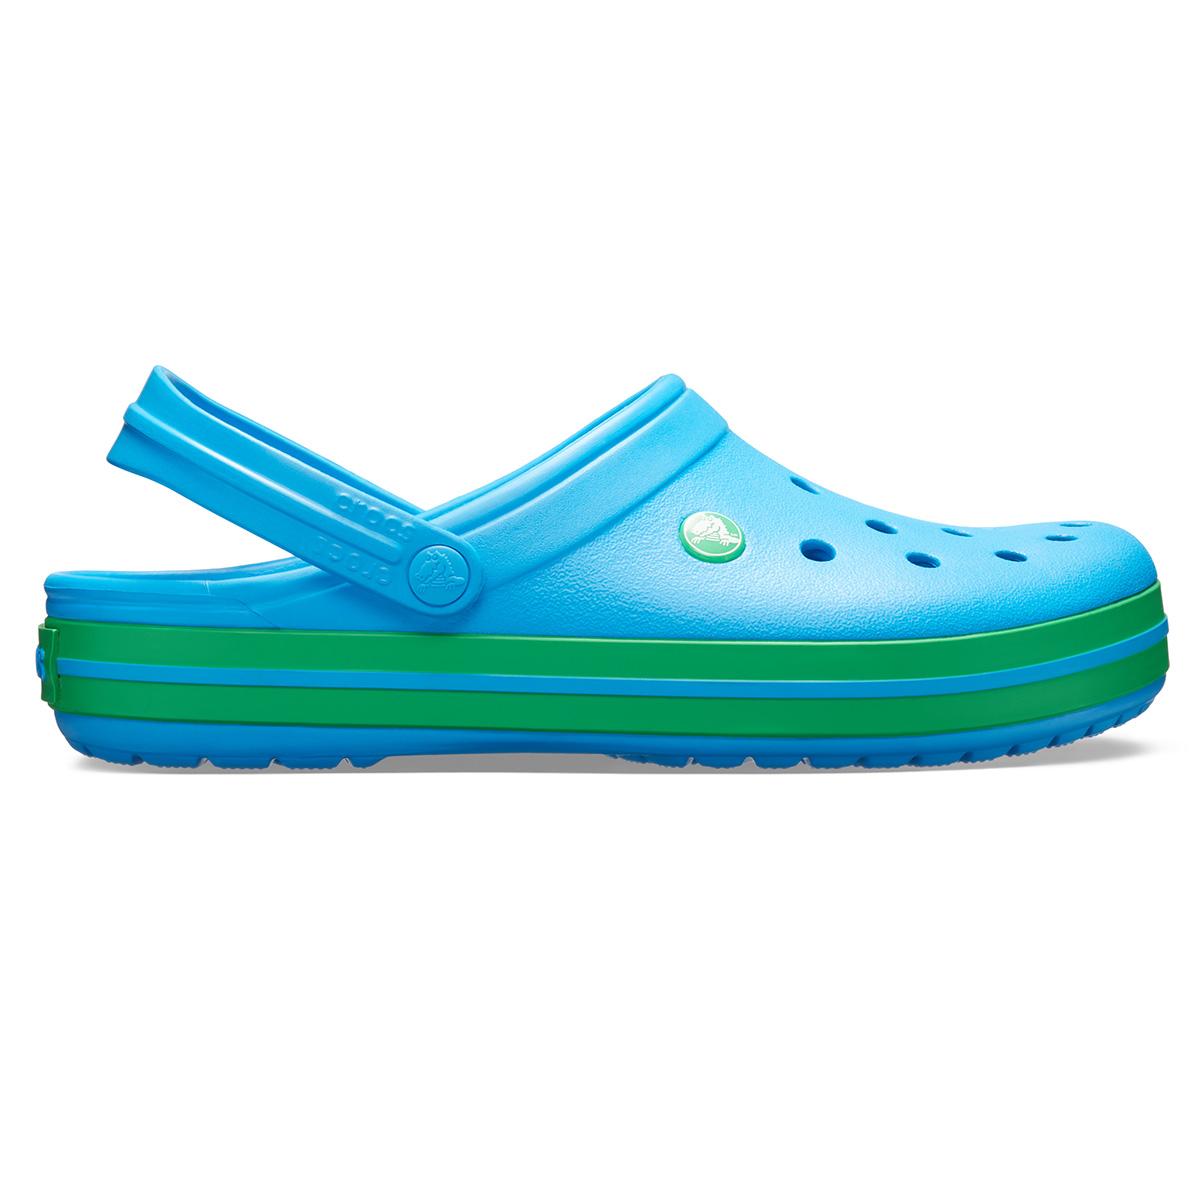 Crocs Crocband - Okyanus/Çim Yeşili